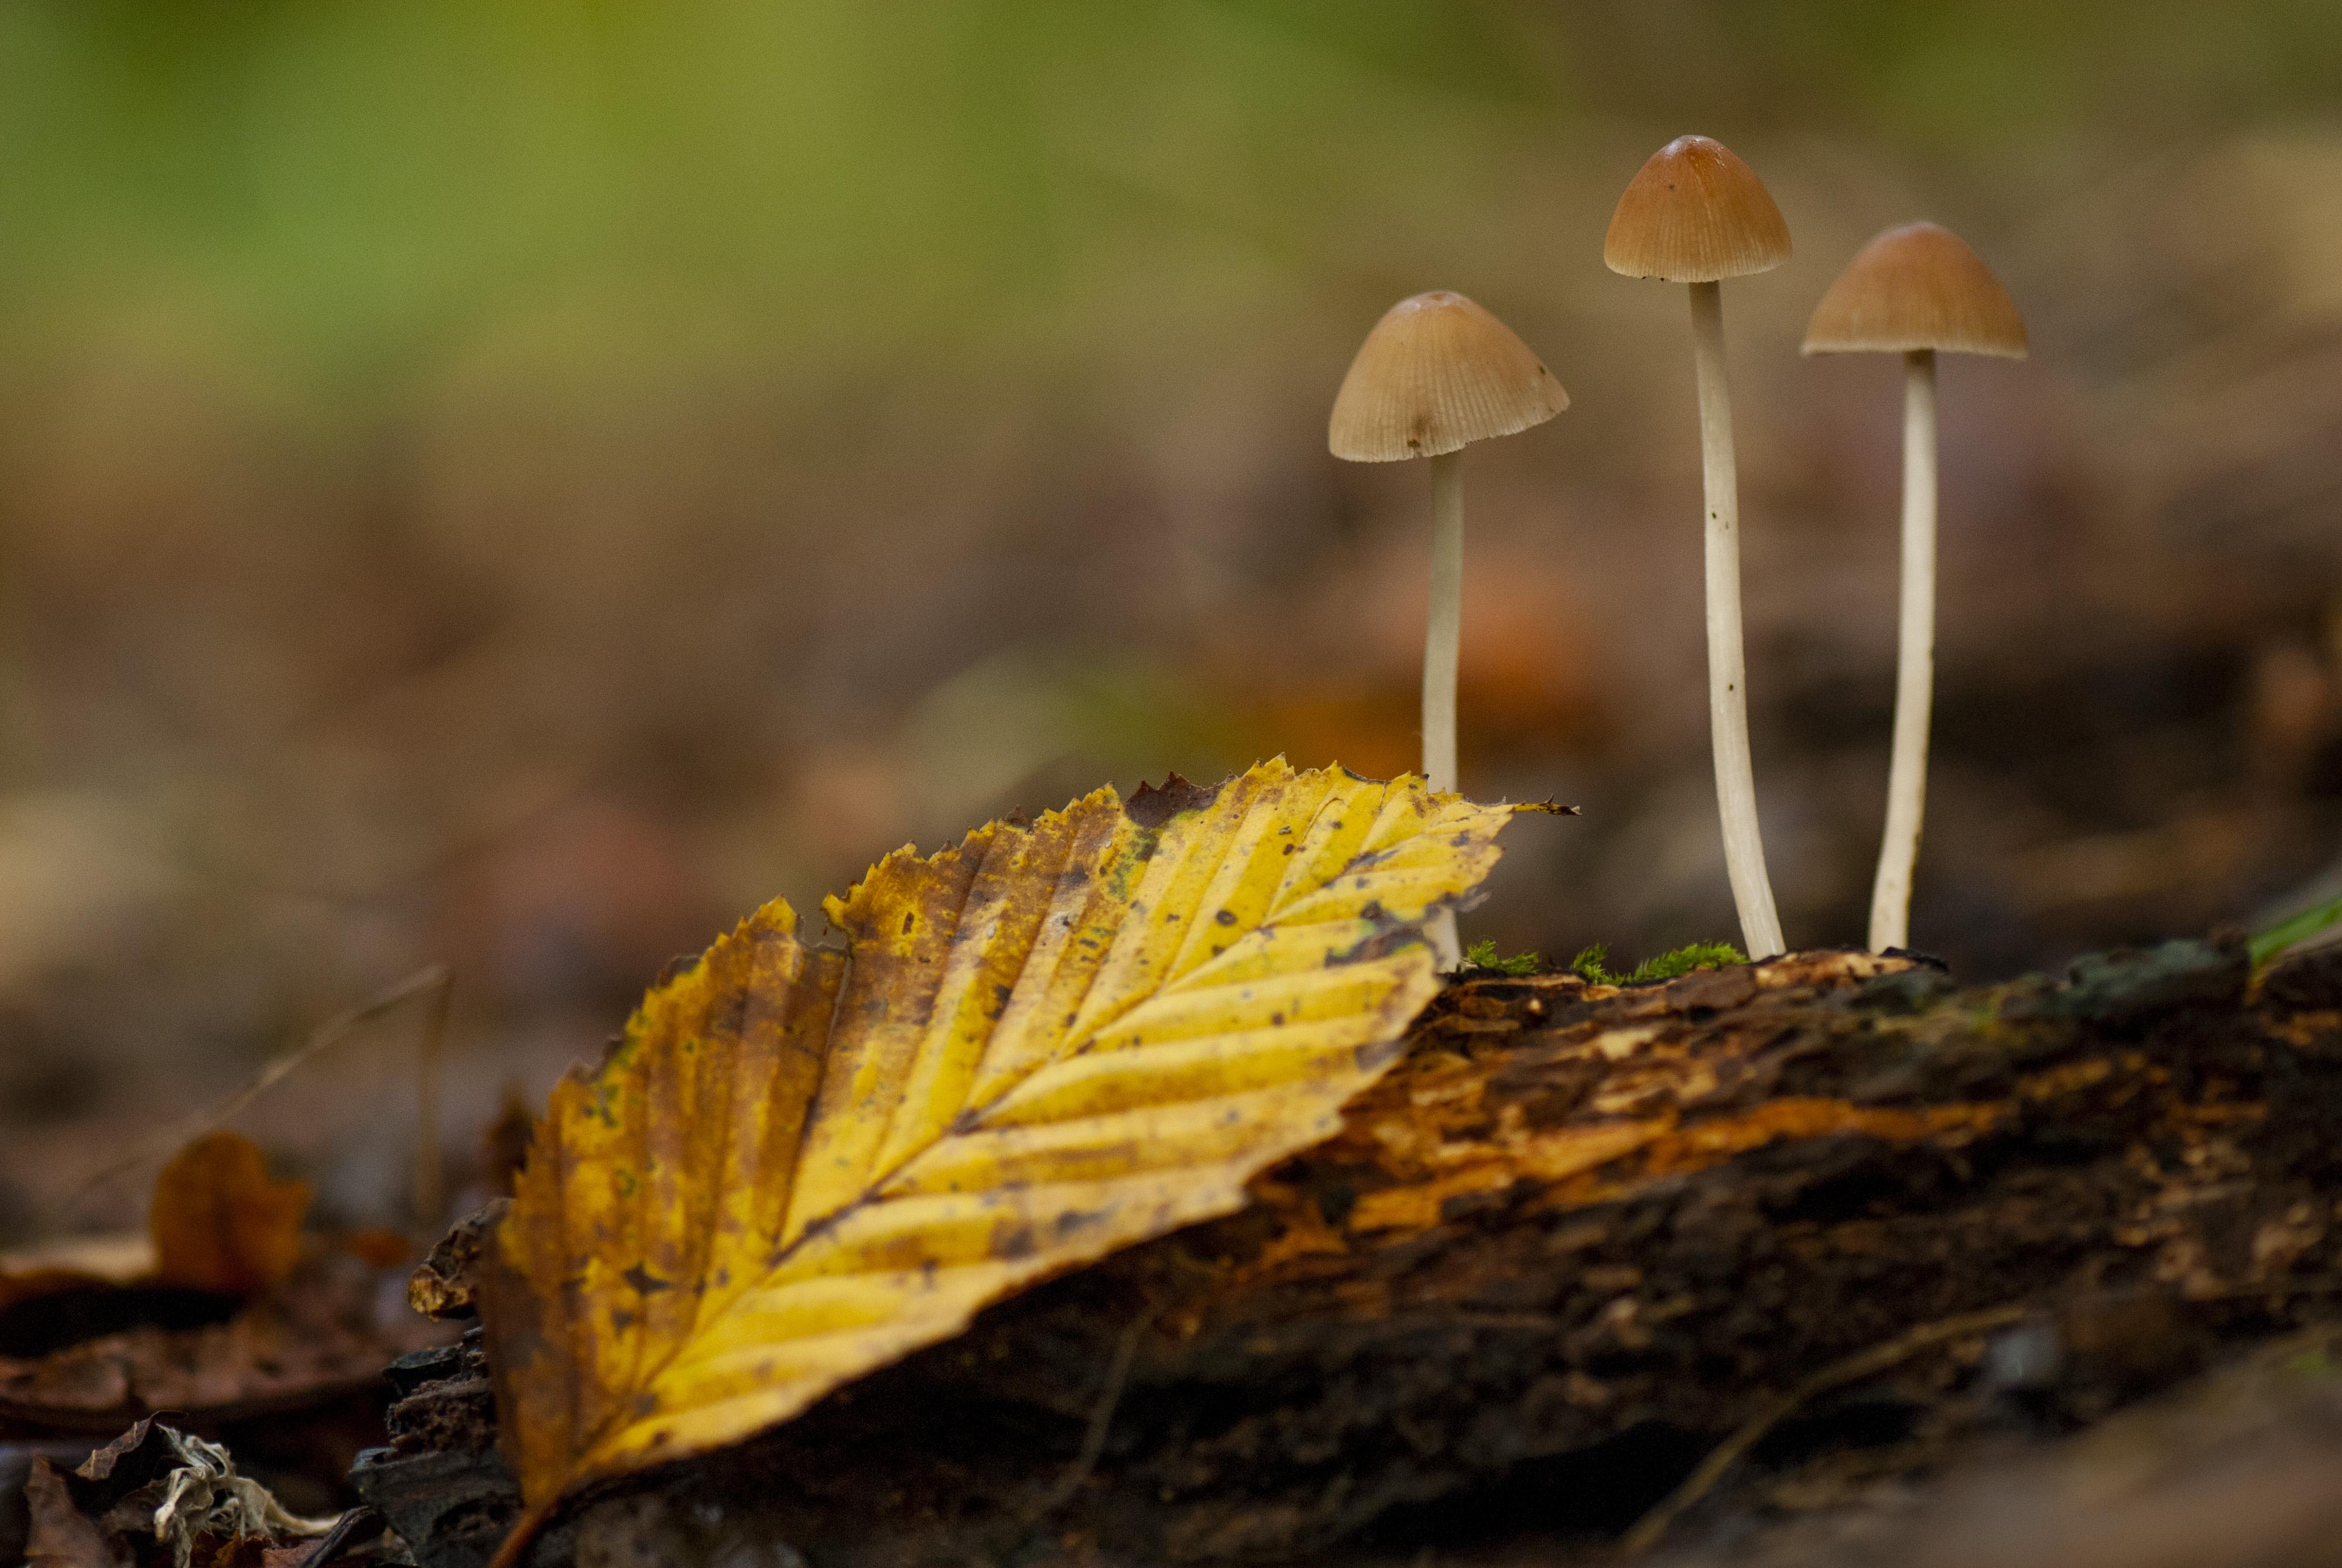 Macro shot of mushrooms on the forest floor